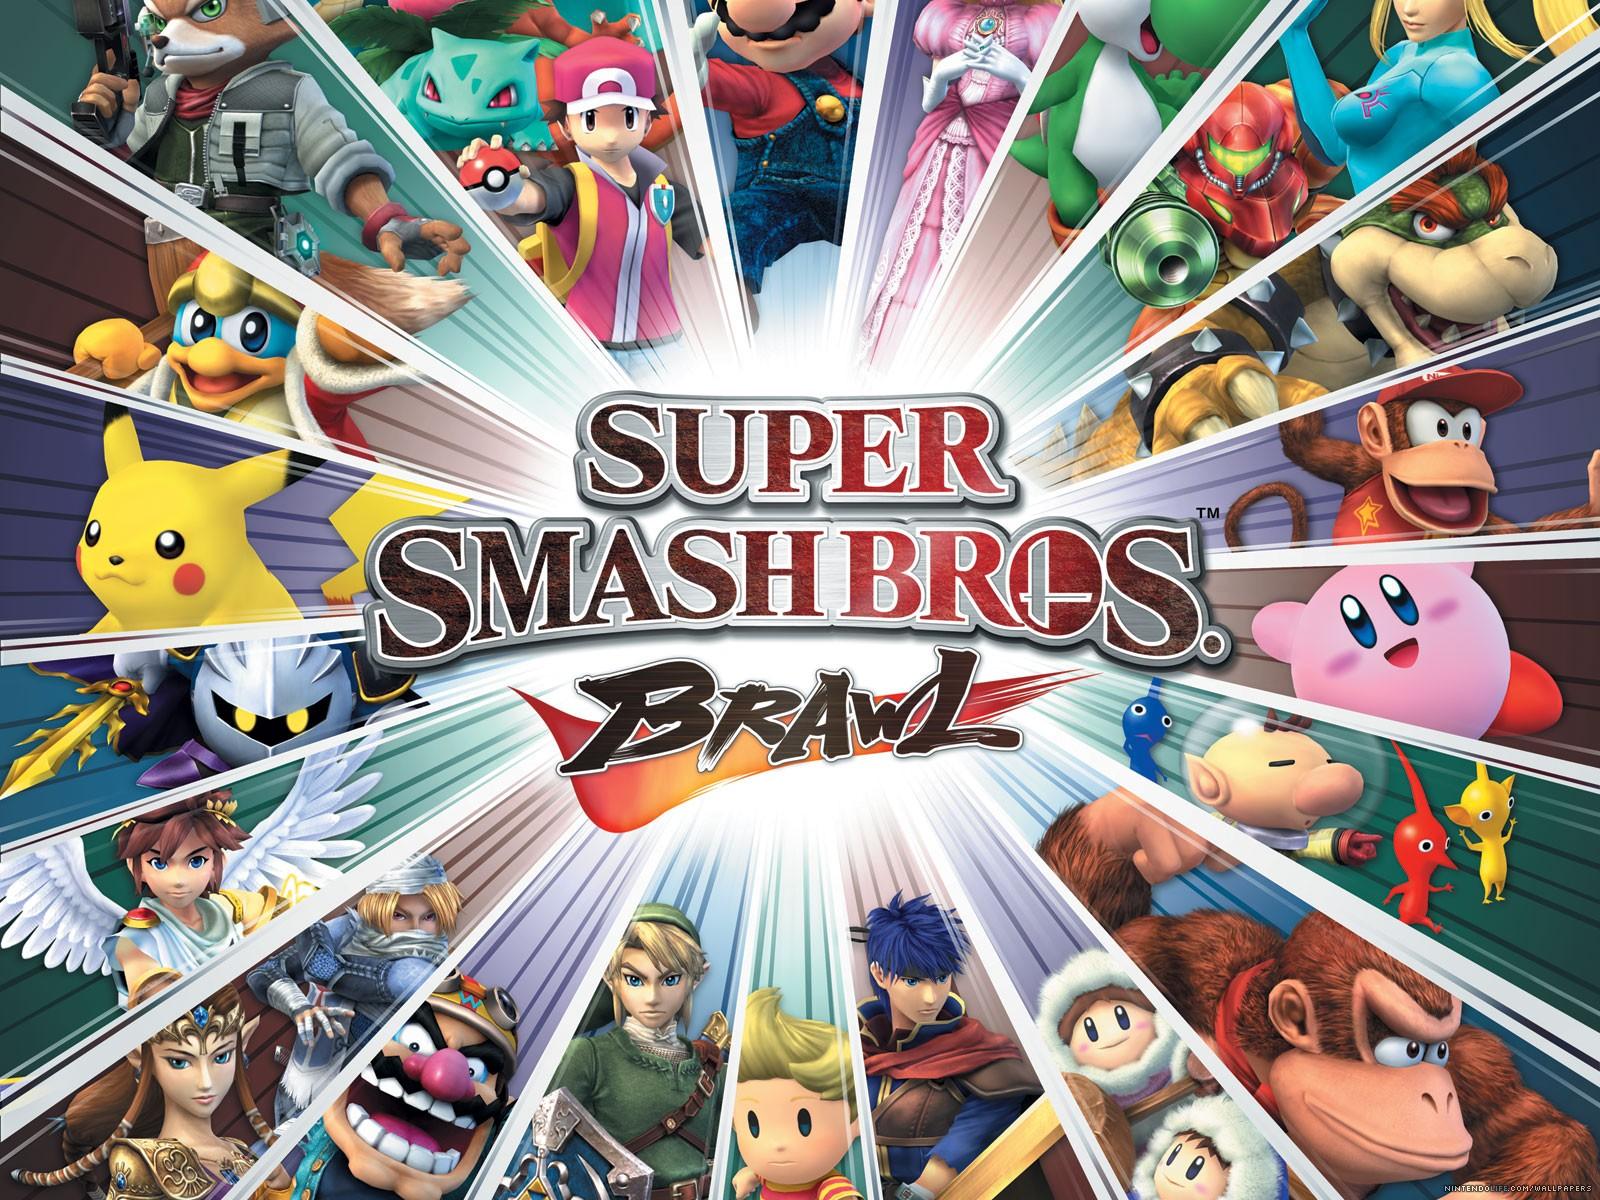 Super Smash Bros Game | Games World